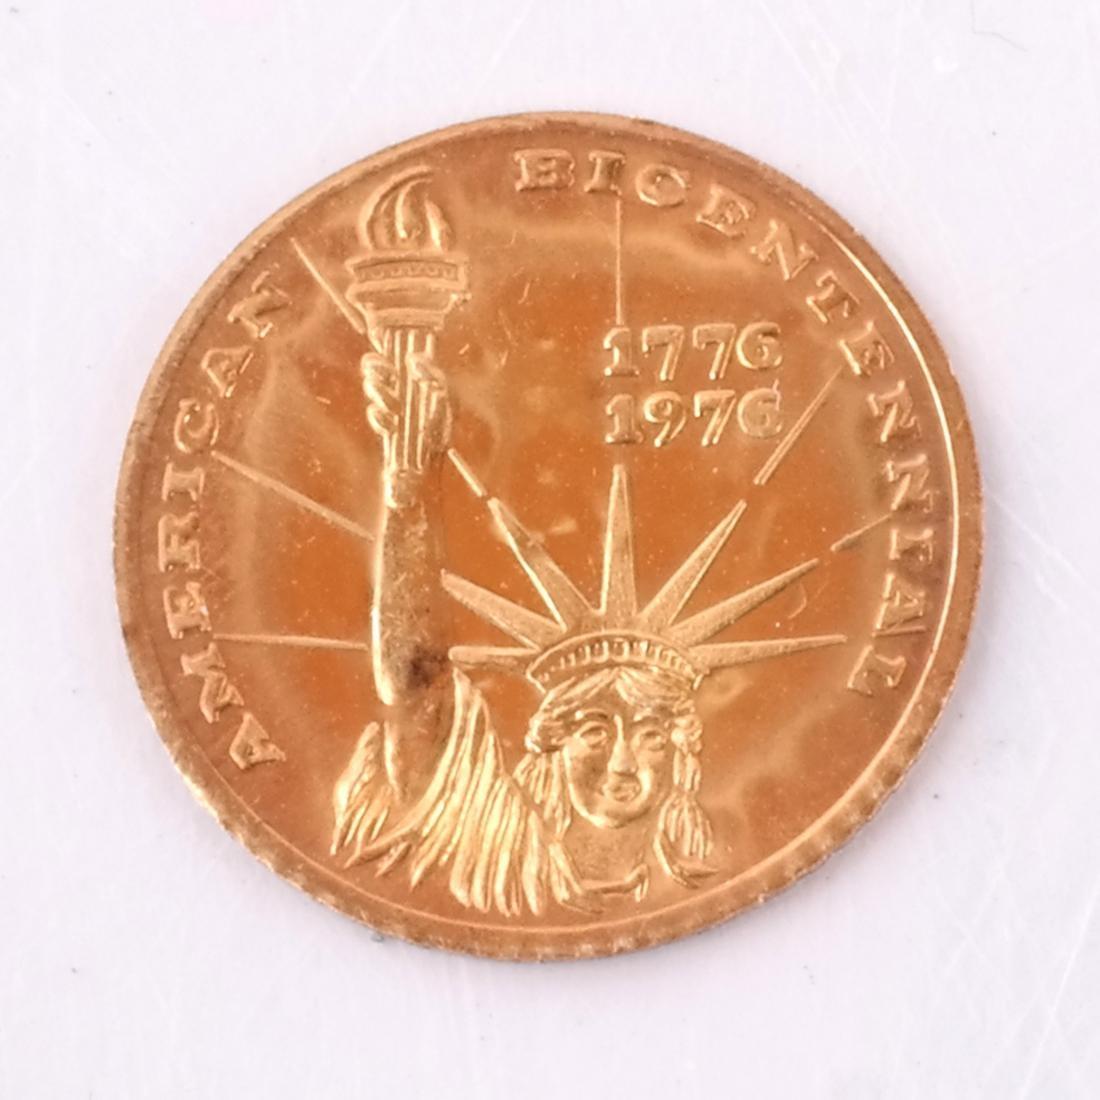 1999 Gold Eagle, Bicentennial, Kennedy - 2